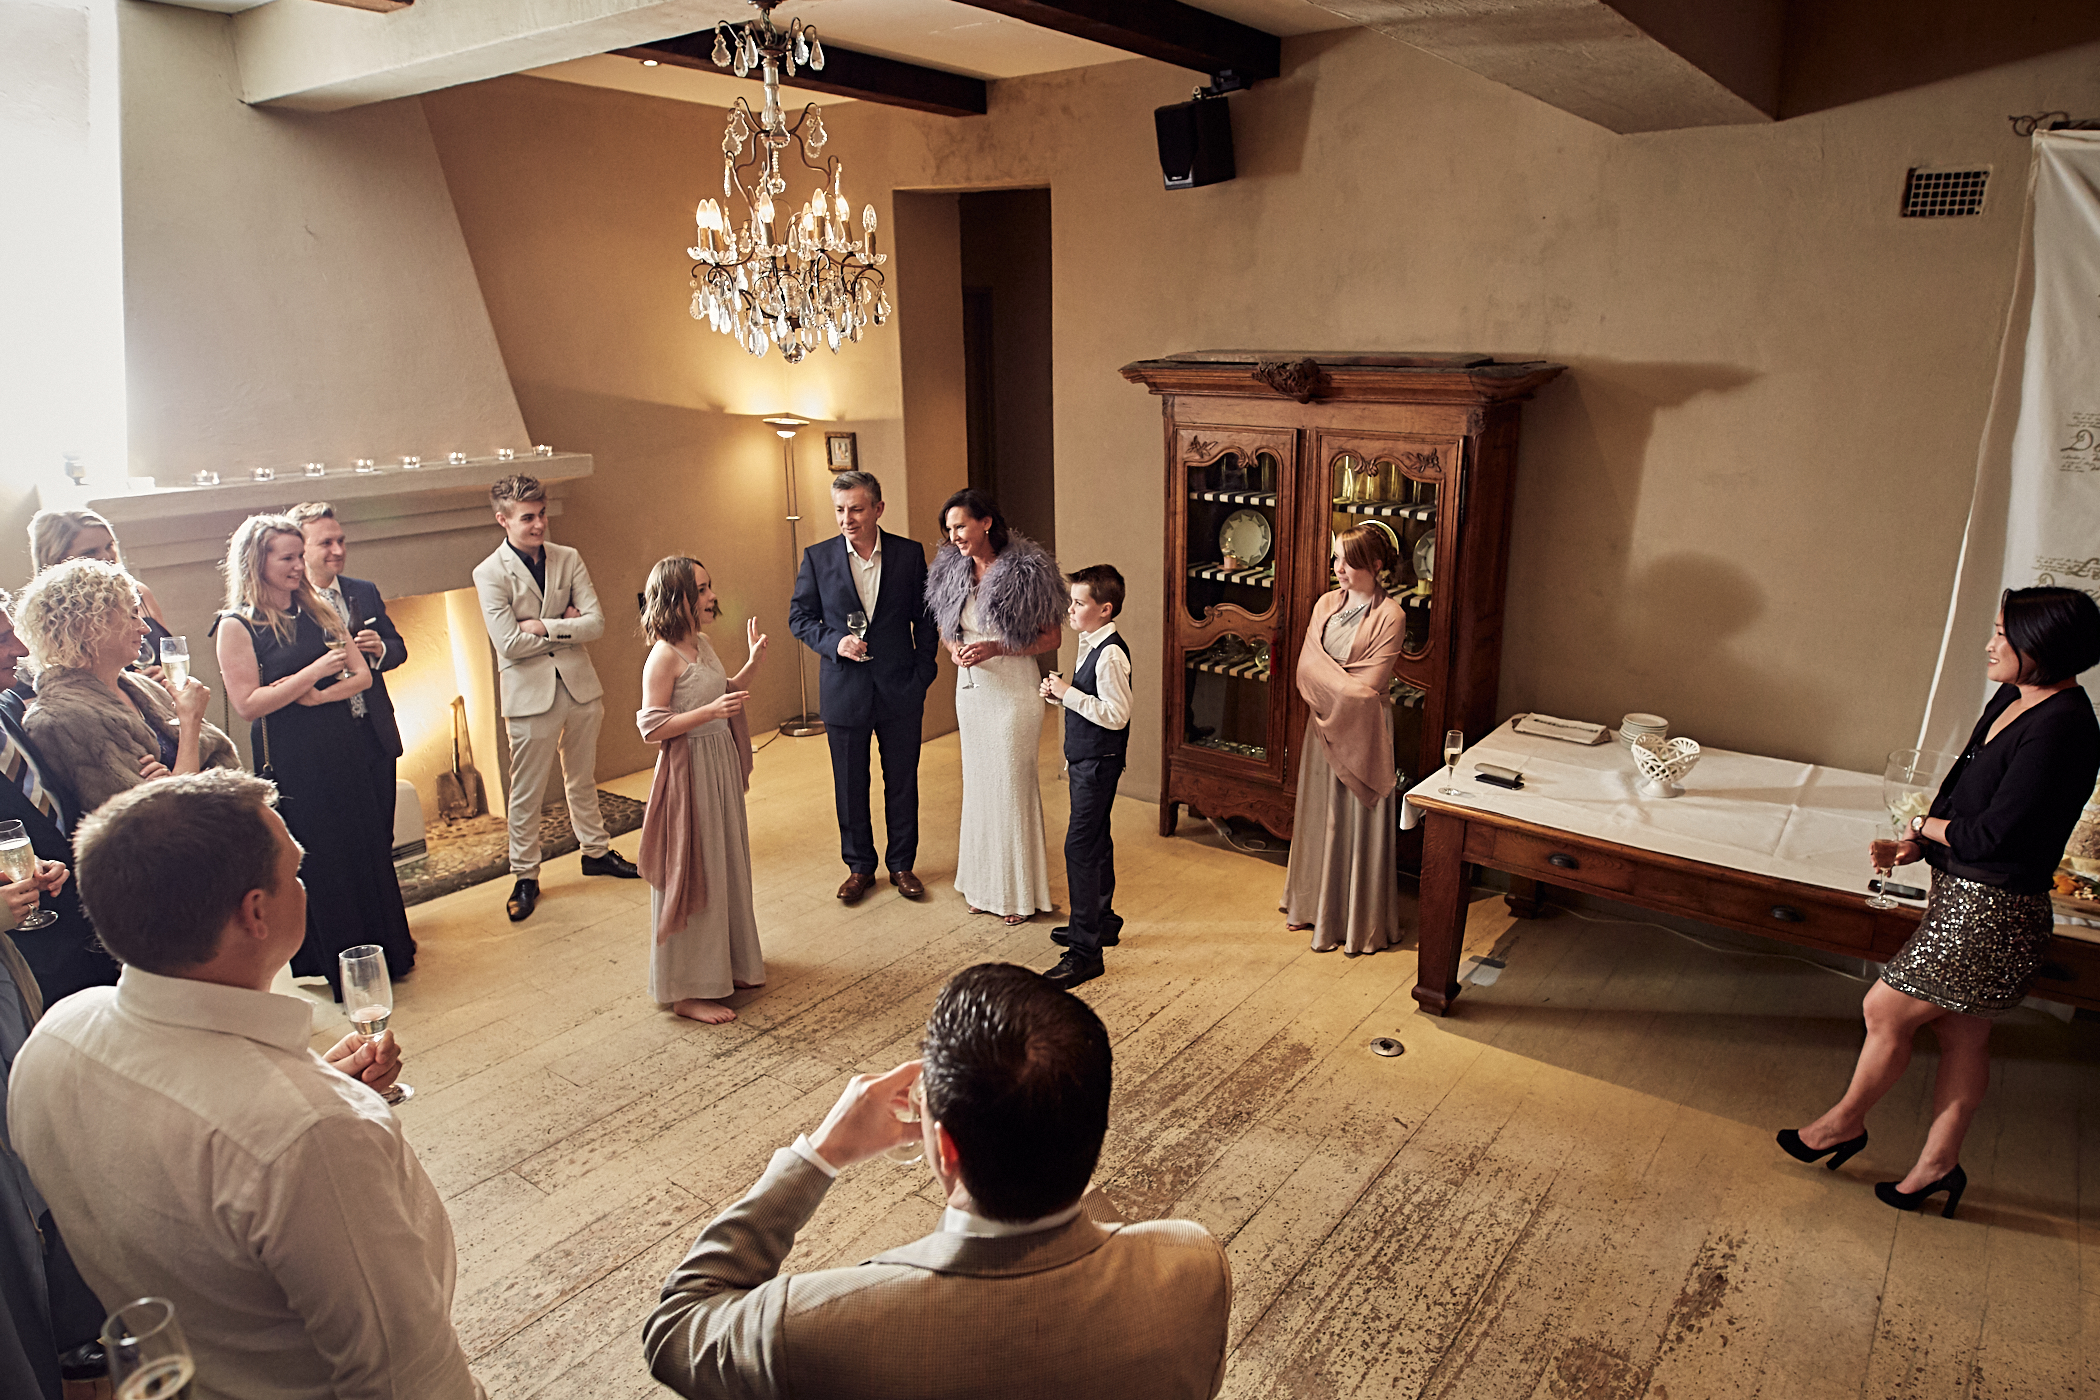 Mantells wedding speeches